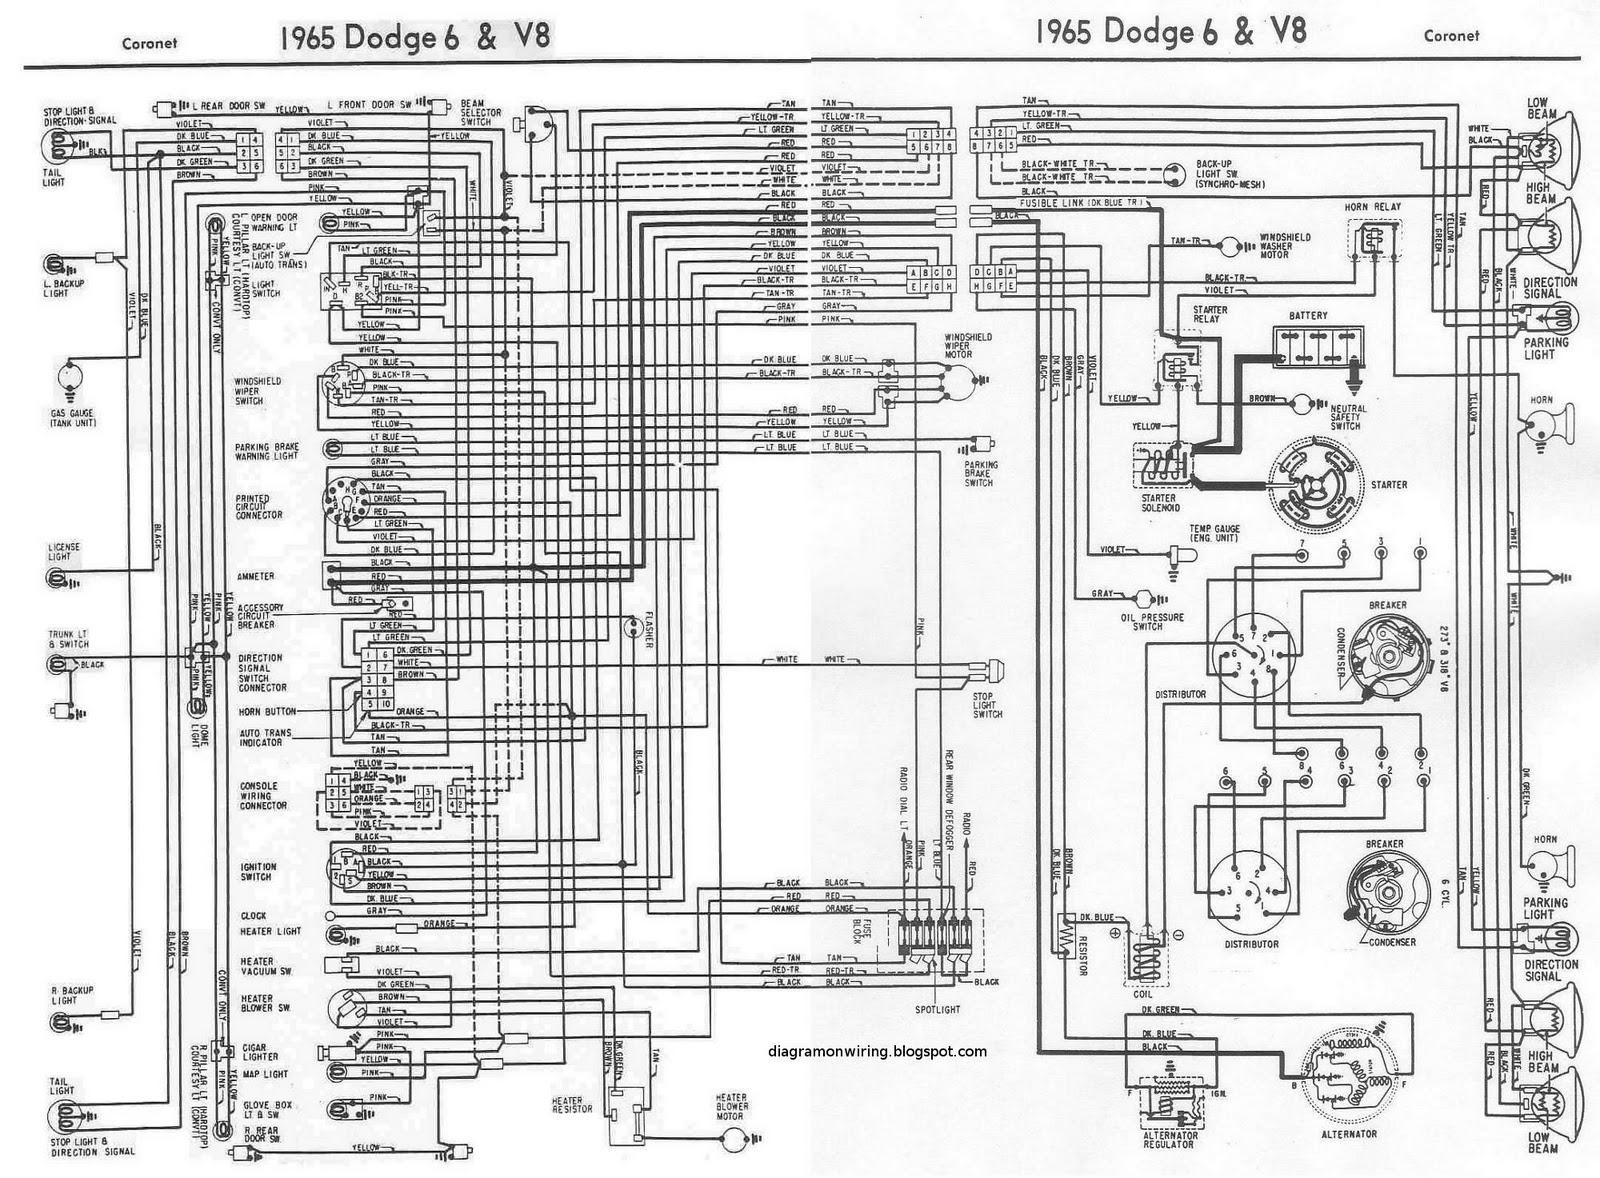 1969 Chevelle Ac Wiring Diagram - Wiring Diagram